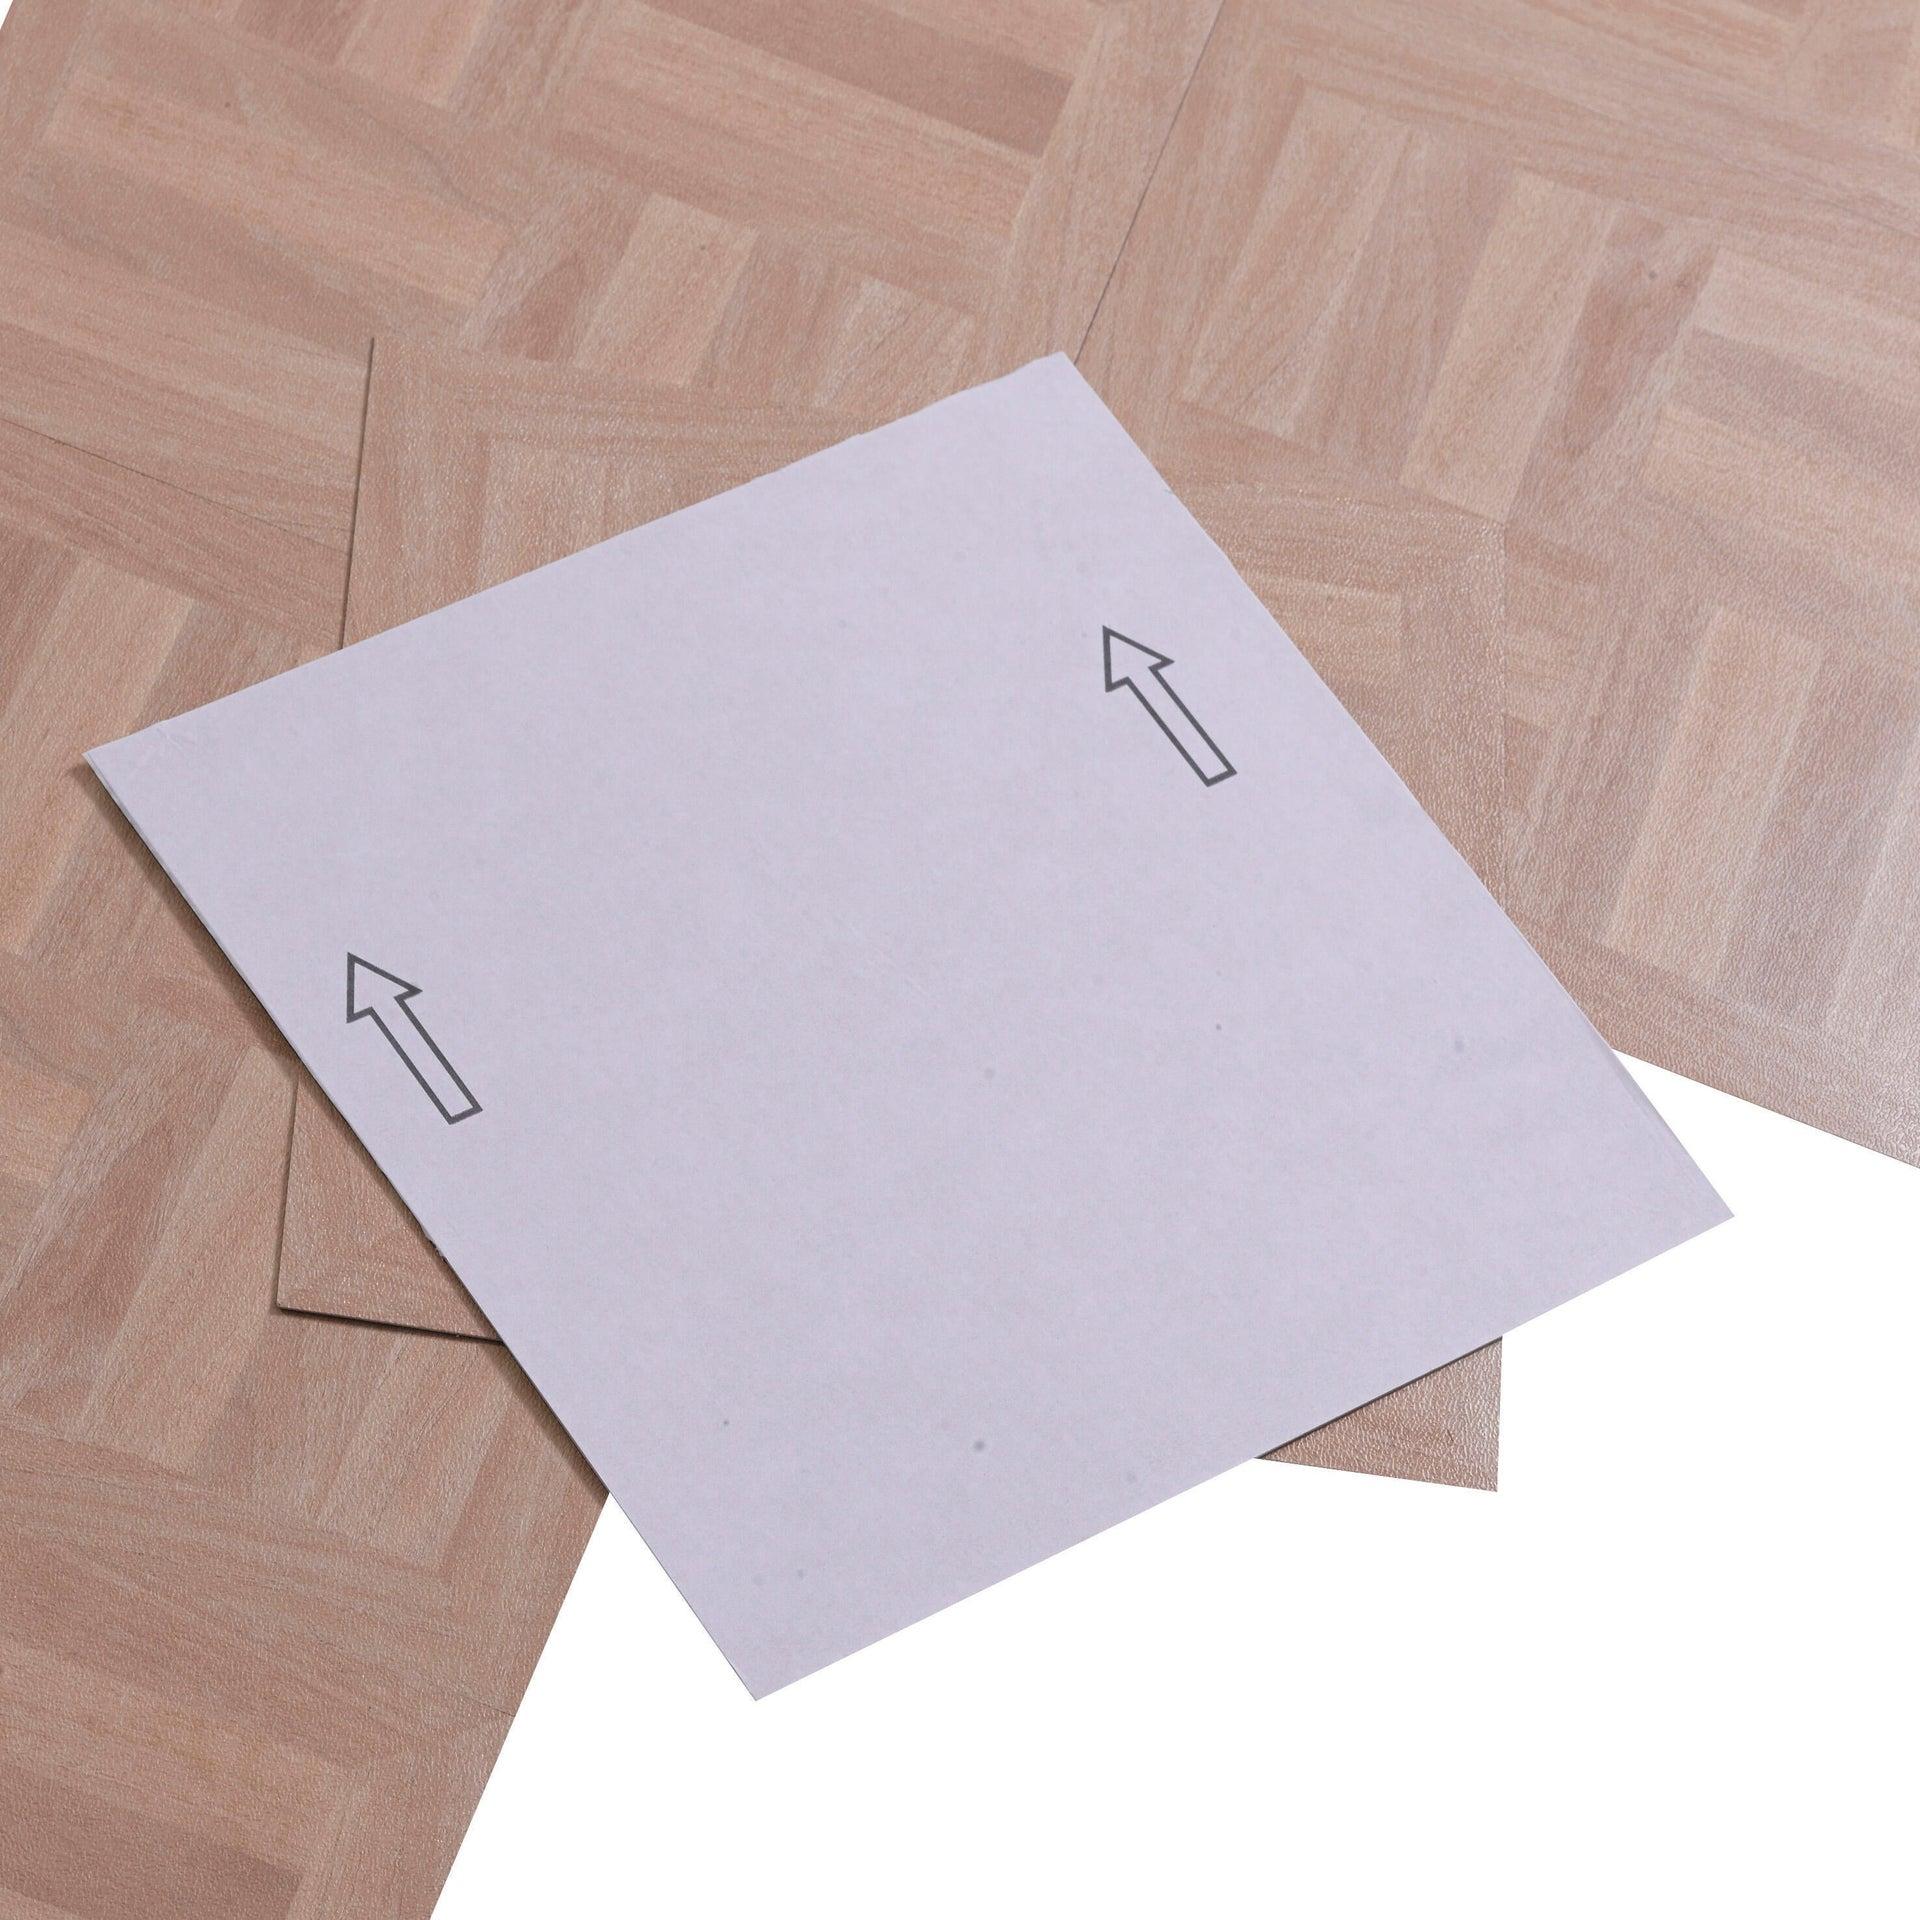 Pavimento PVC adesivo Dugan Sp 1.2 mm giallo / dorato - 7